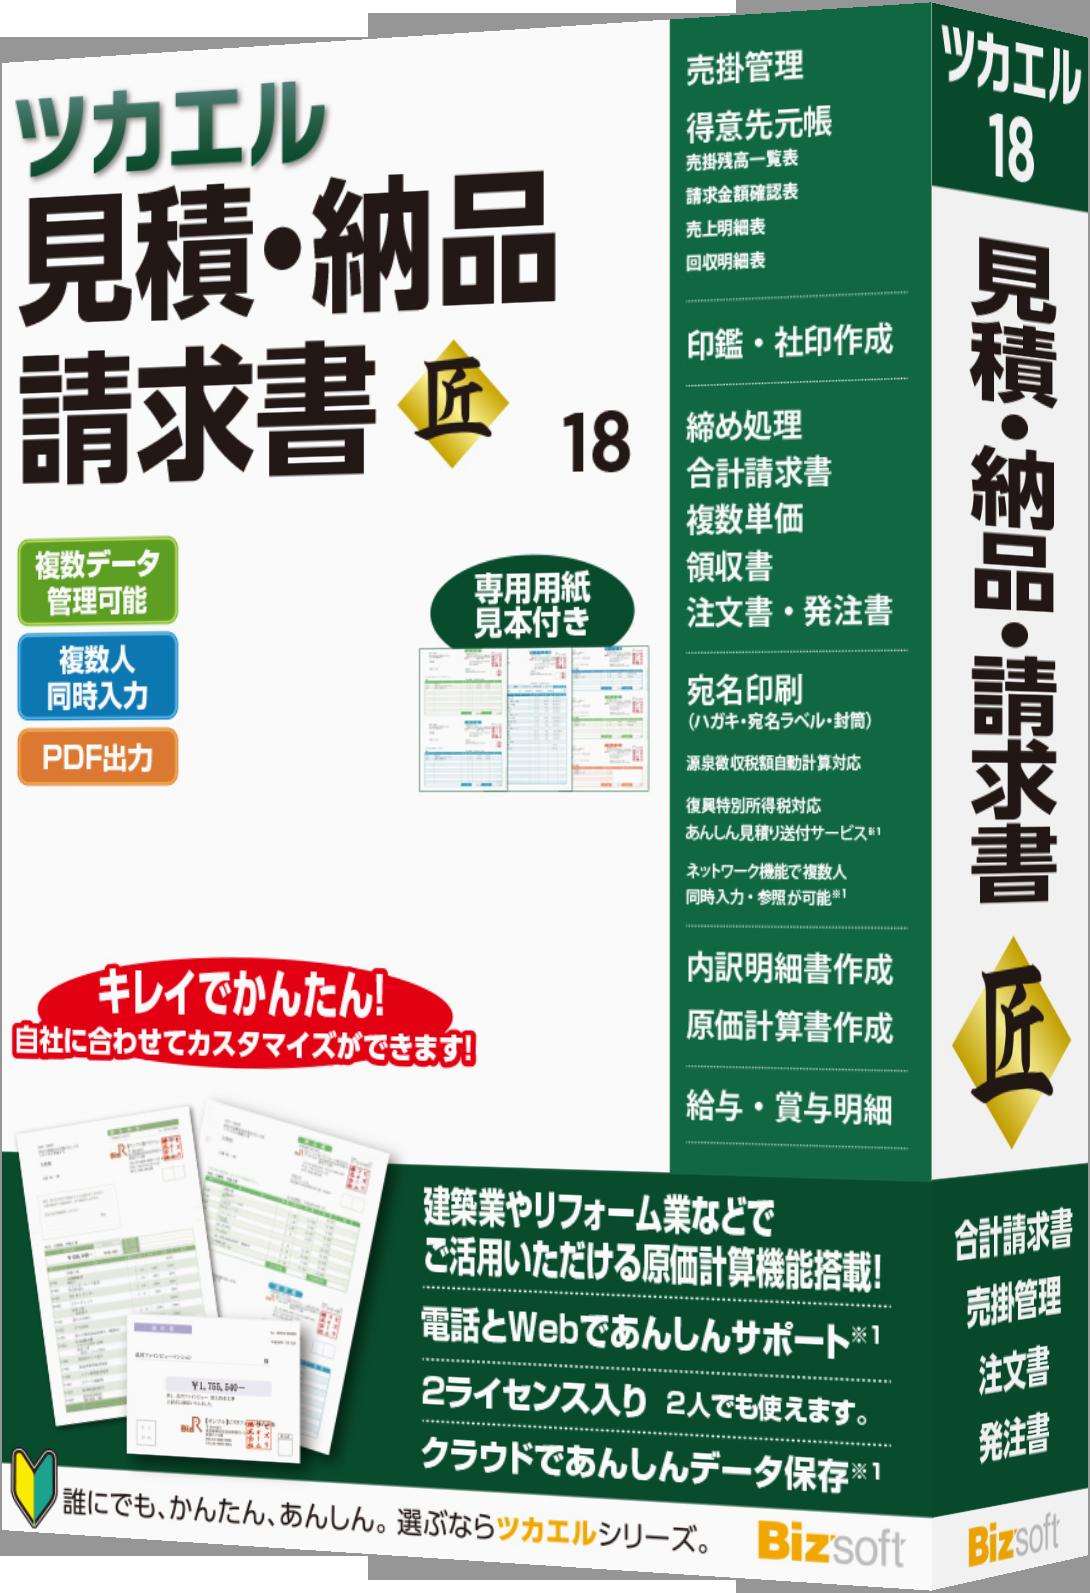 "「<a href=""https://www.bizsoft.co.jp/products/estimate/index.html"">ツカエル見積・納品・請求書 18 匠</a>」パッケージ"